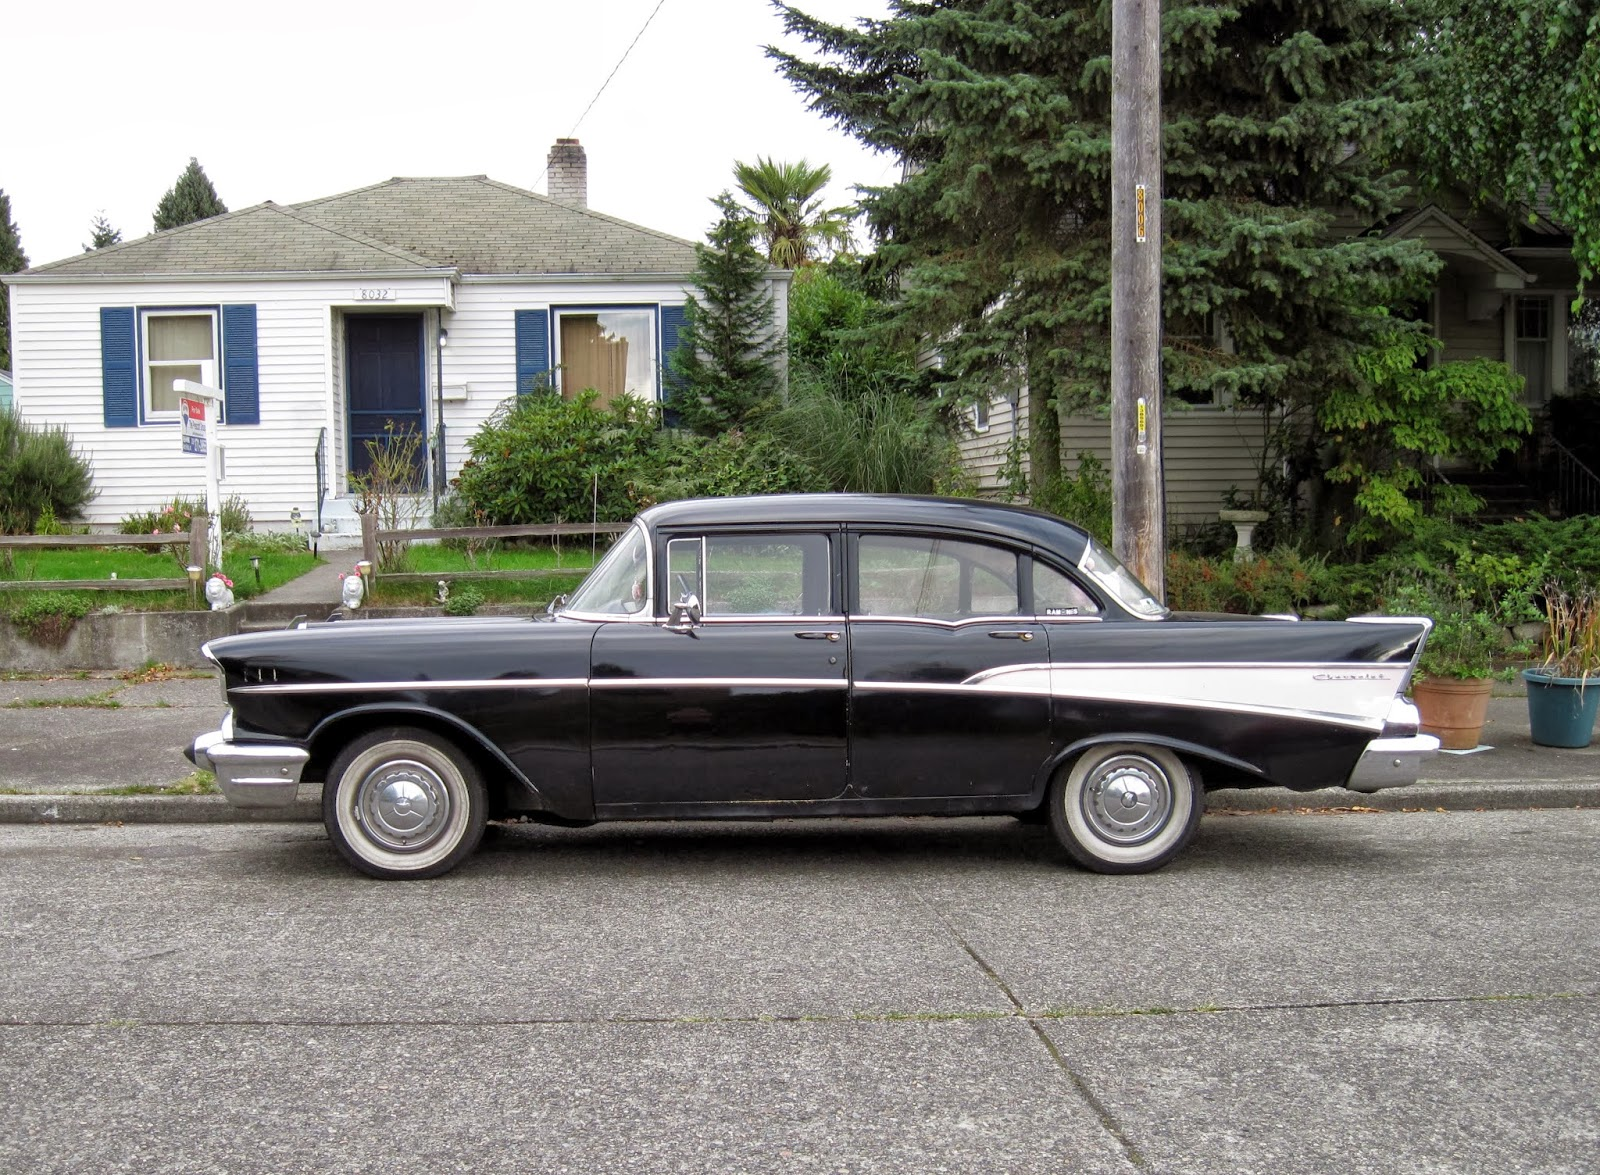 Seattle U0026 39 S Classics  1957 Chevrolet 210 Sedan